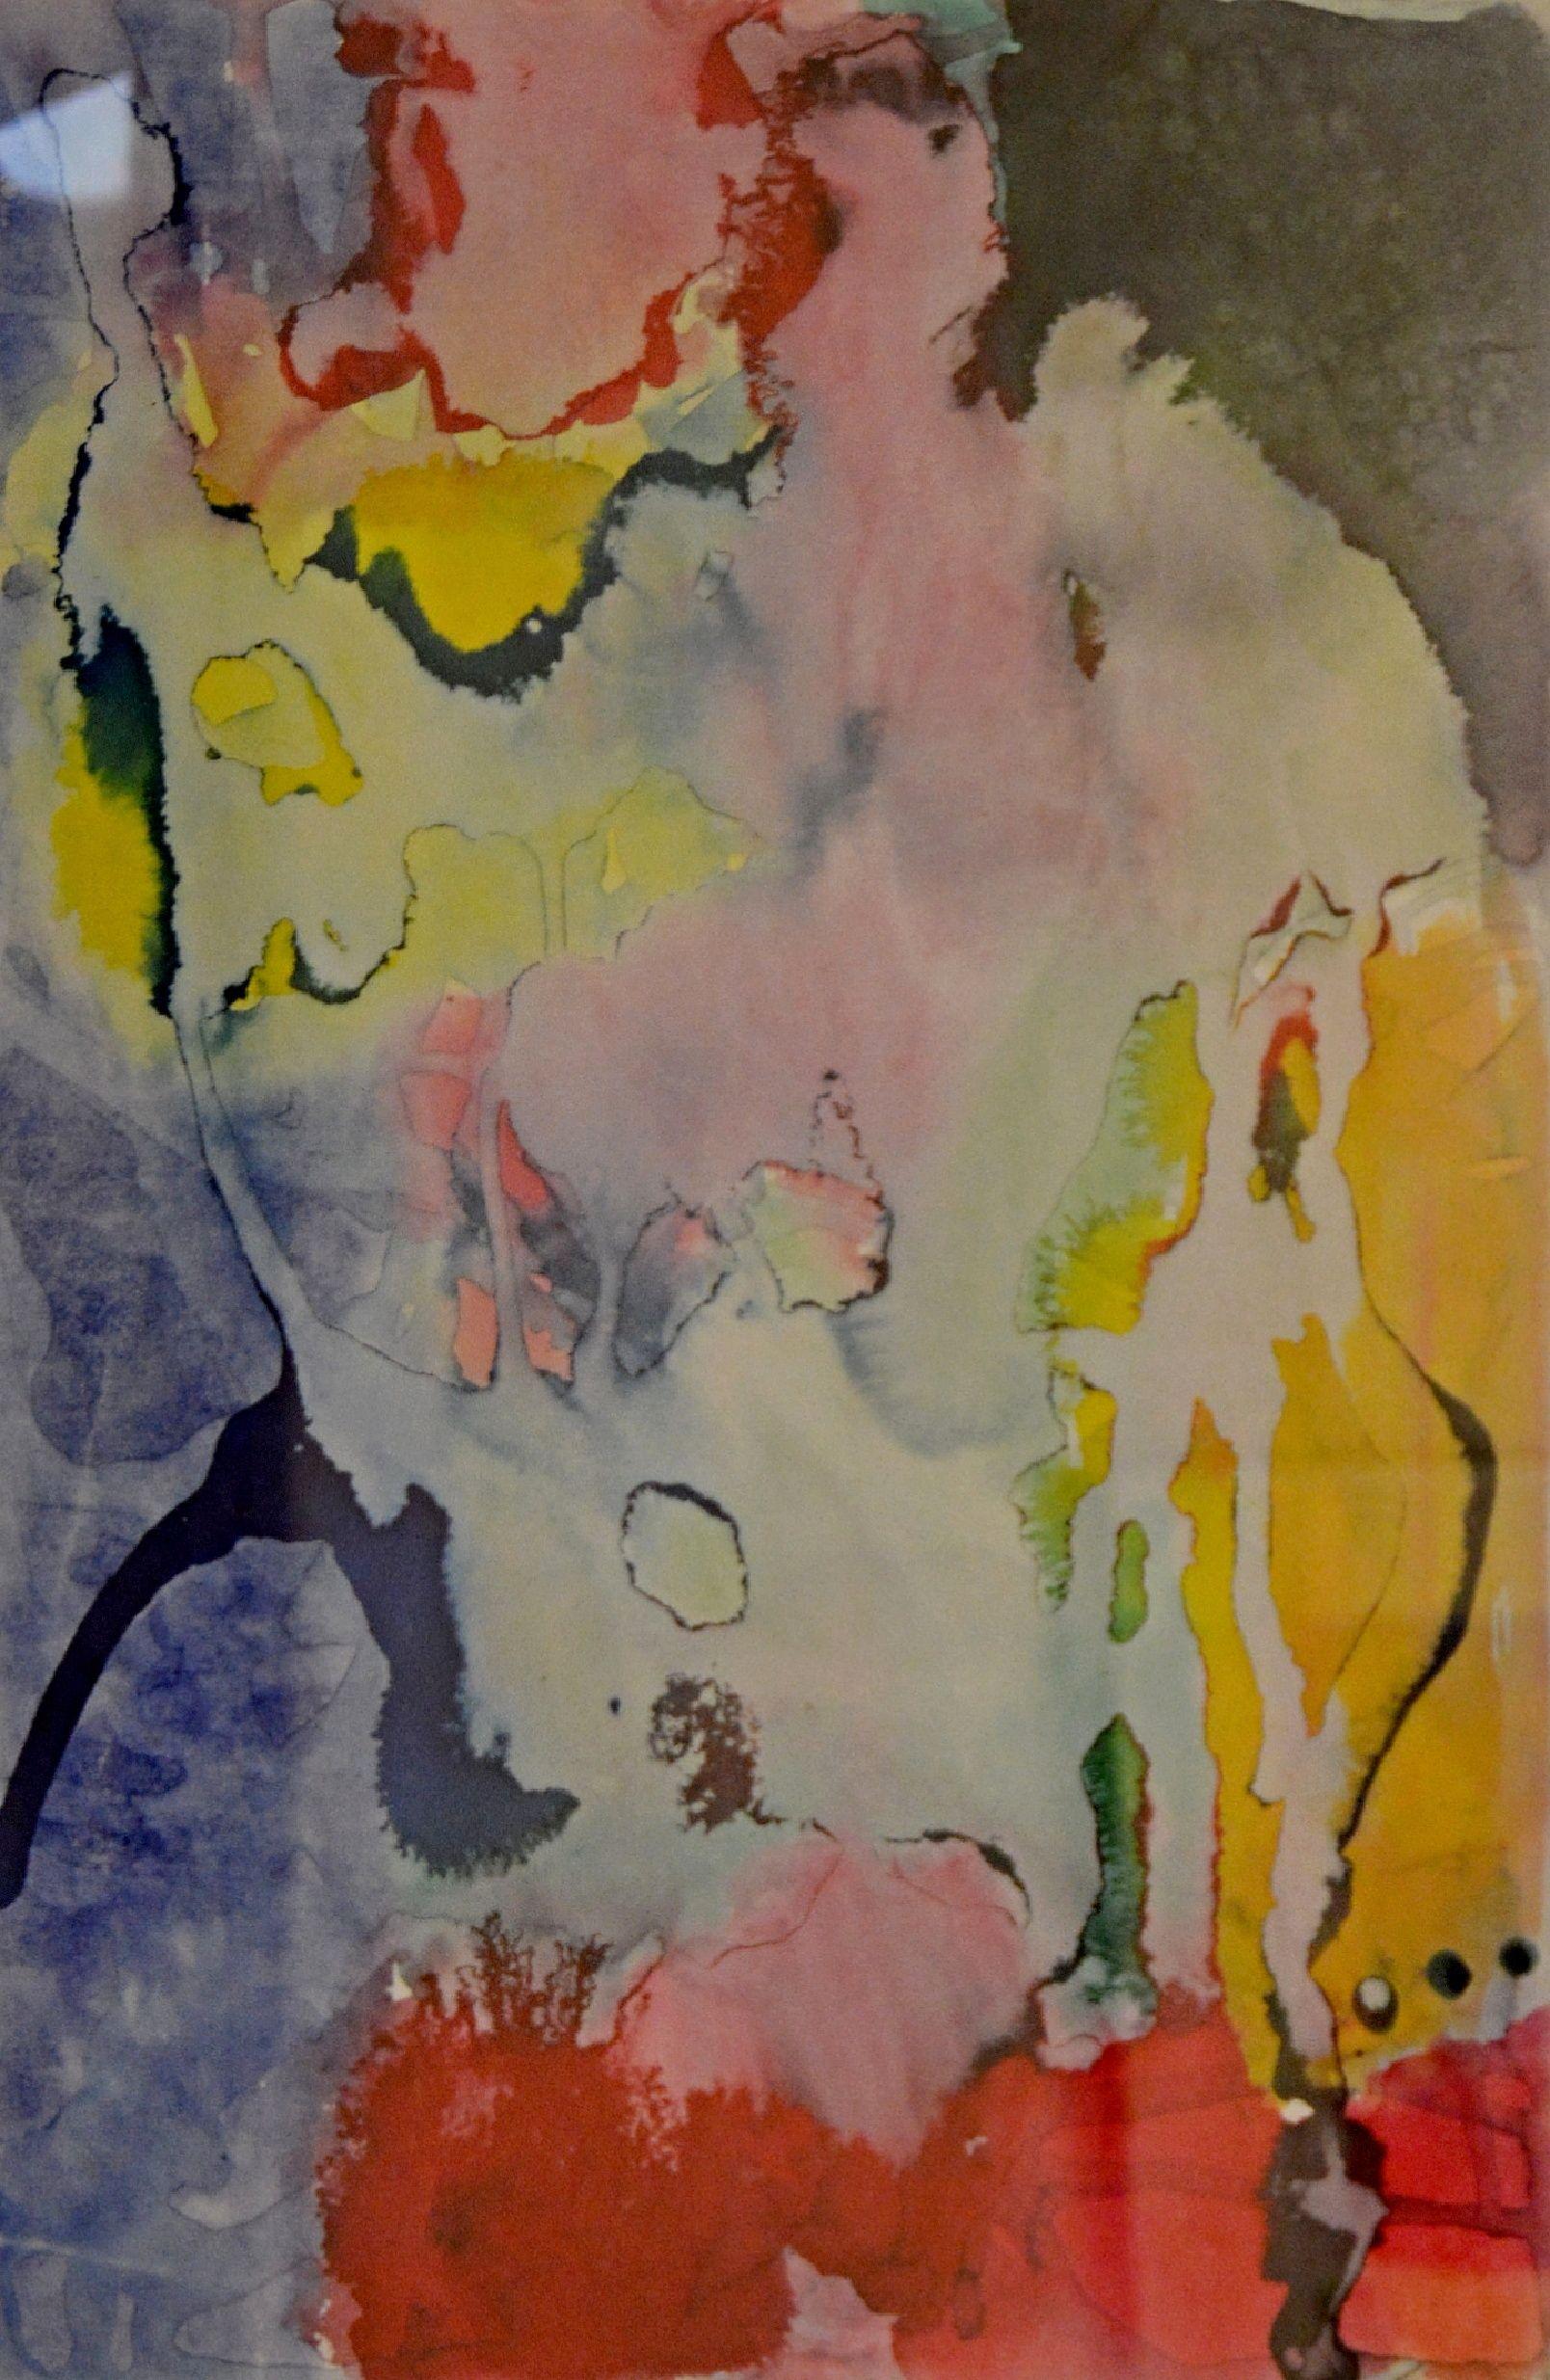 Martin Hronza: Bez názvu, dekalk a akvarel, 42 x 30 cm, 2005. Foto: Jan Dočekal